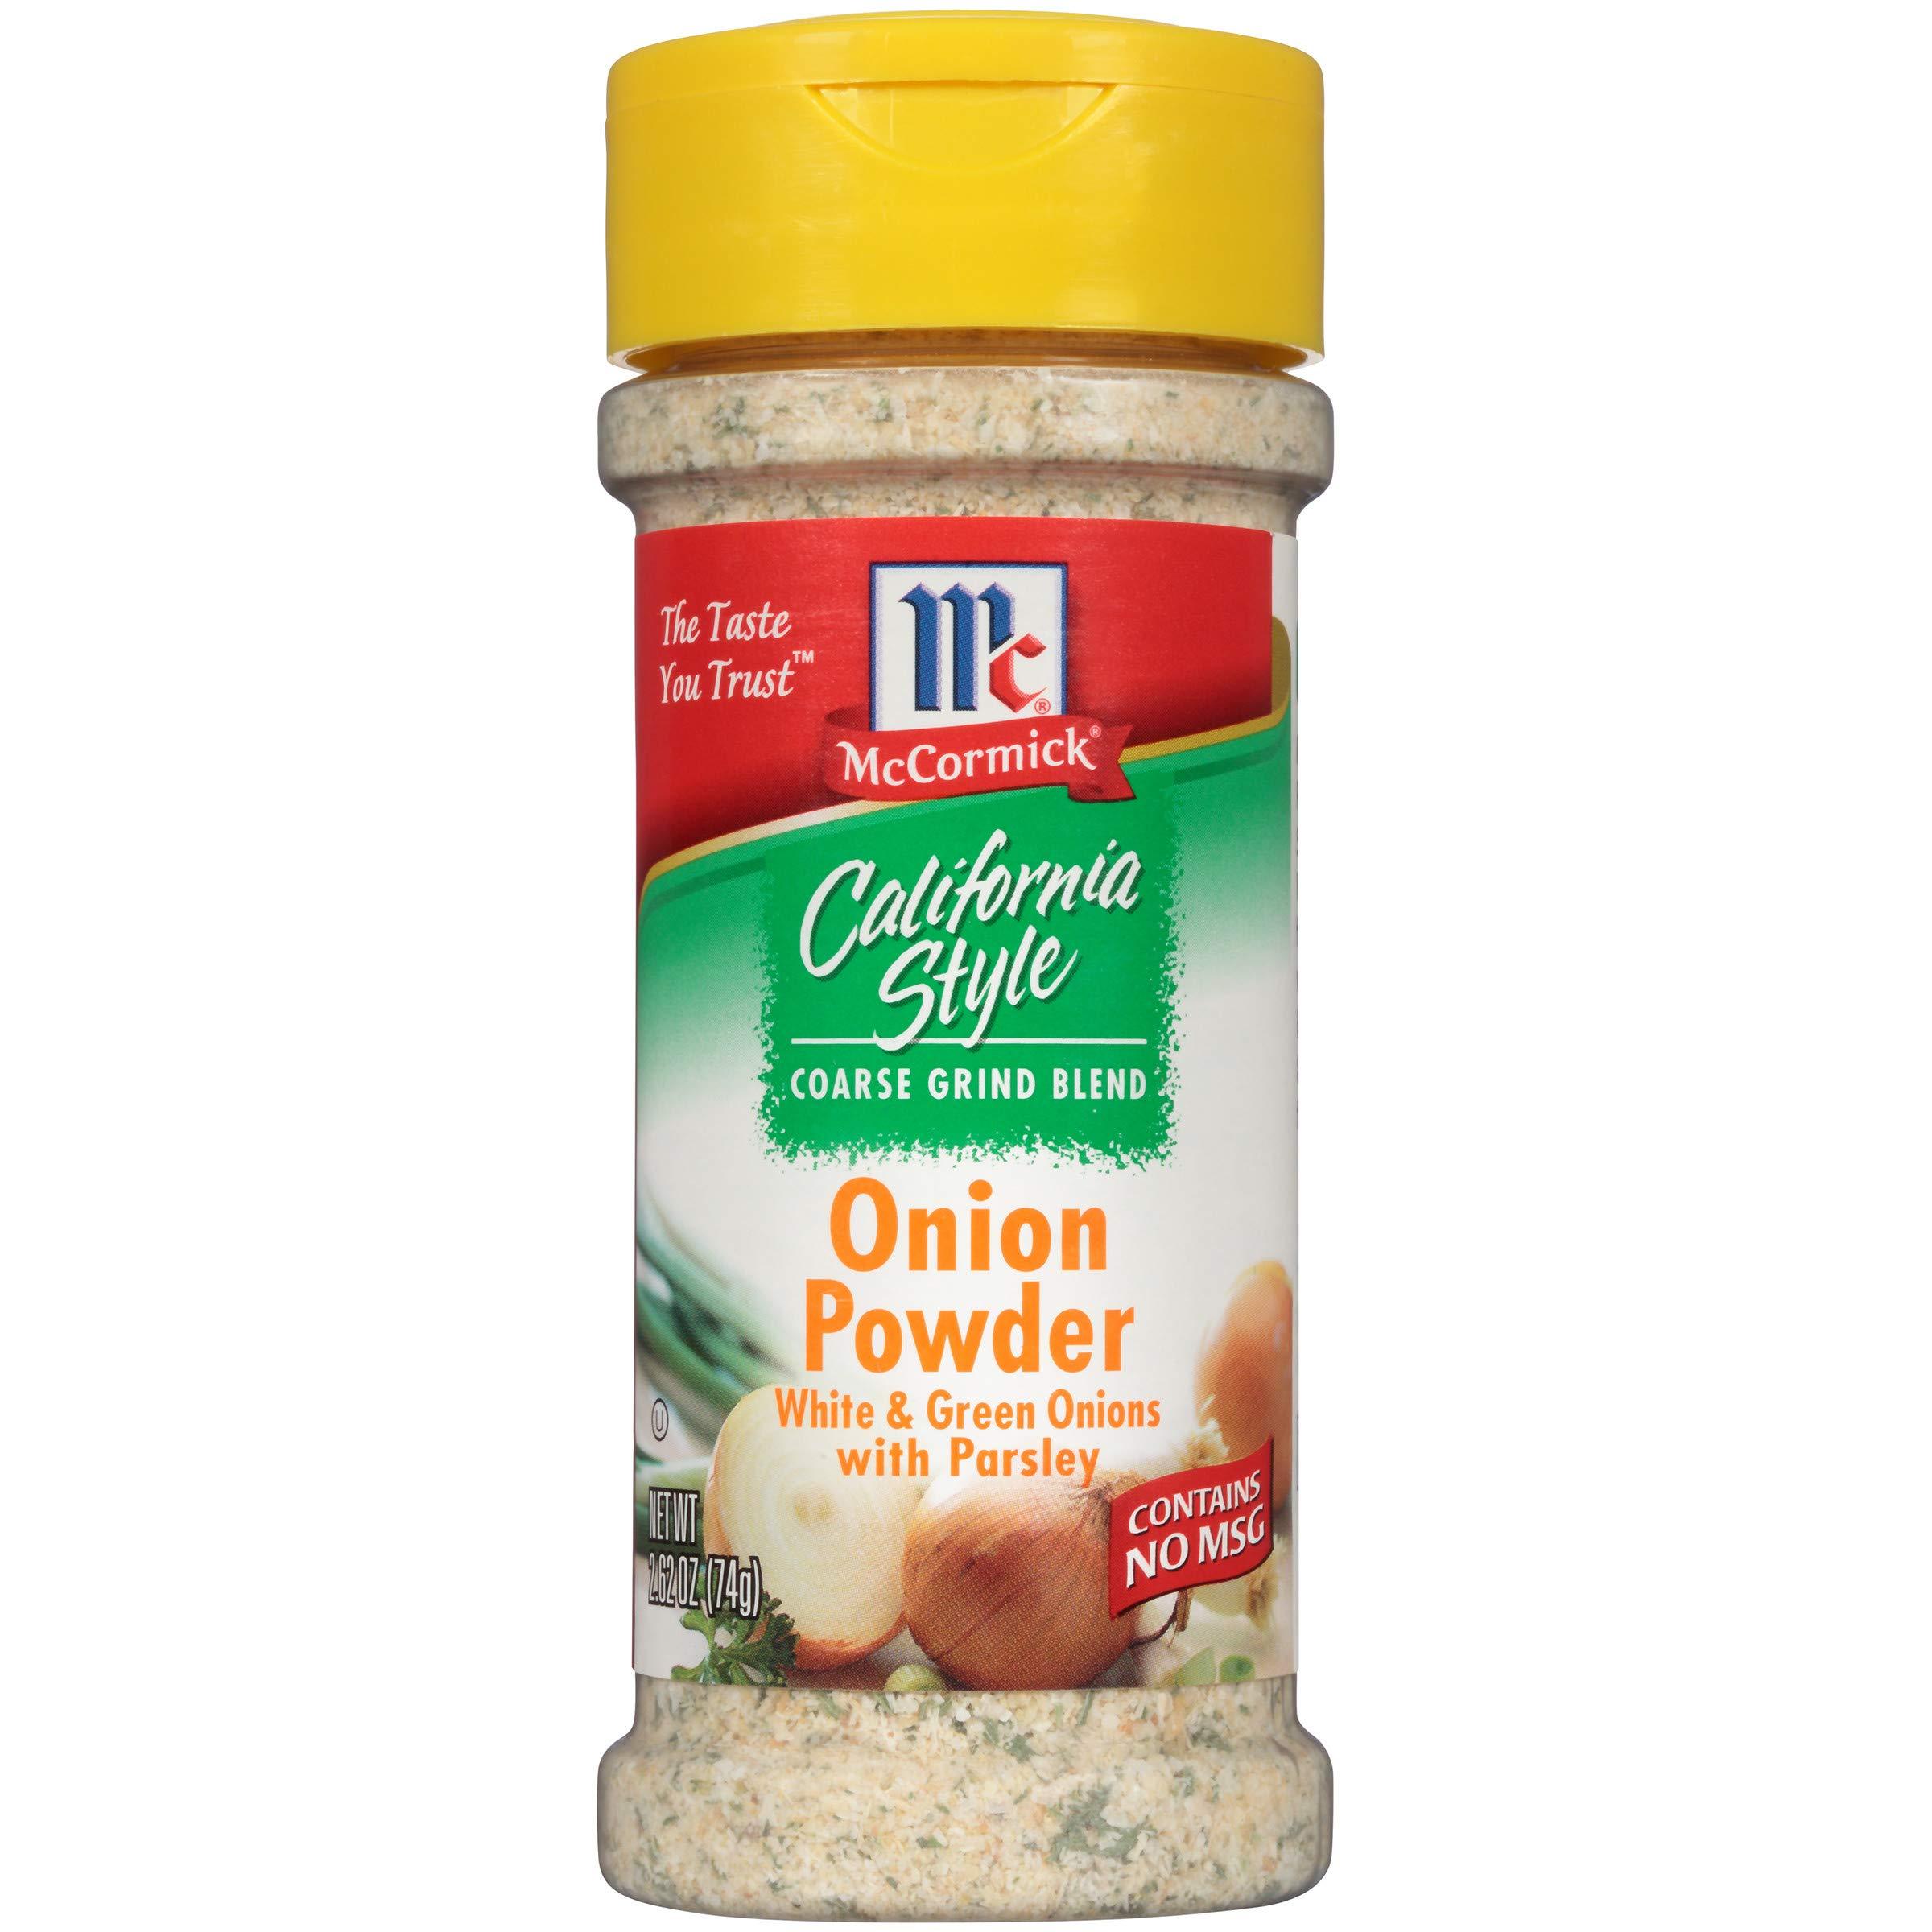 McCormick California Style Coarse Grind Blend Onion Powder, 2.62 oz